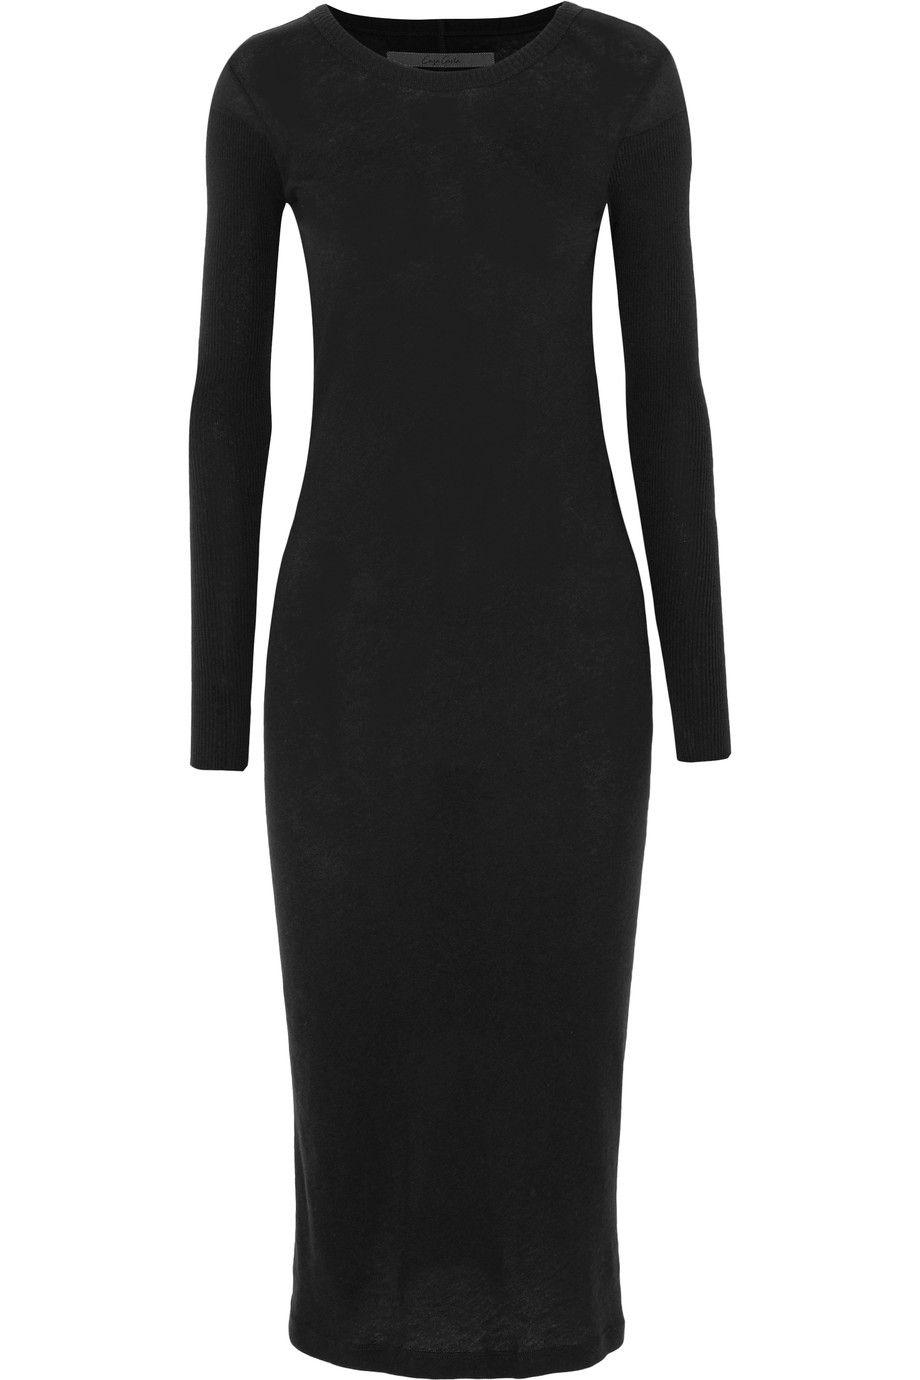 Cheap Finishline Enza Costa Woman Cotton-jersey Midi Dress Black Size L Enza Costa For Cheap Discount Authentic Cheap Visit New 5bnP3